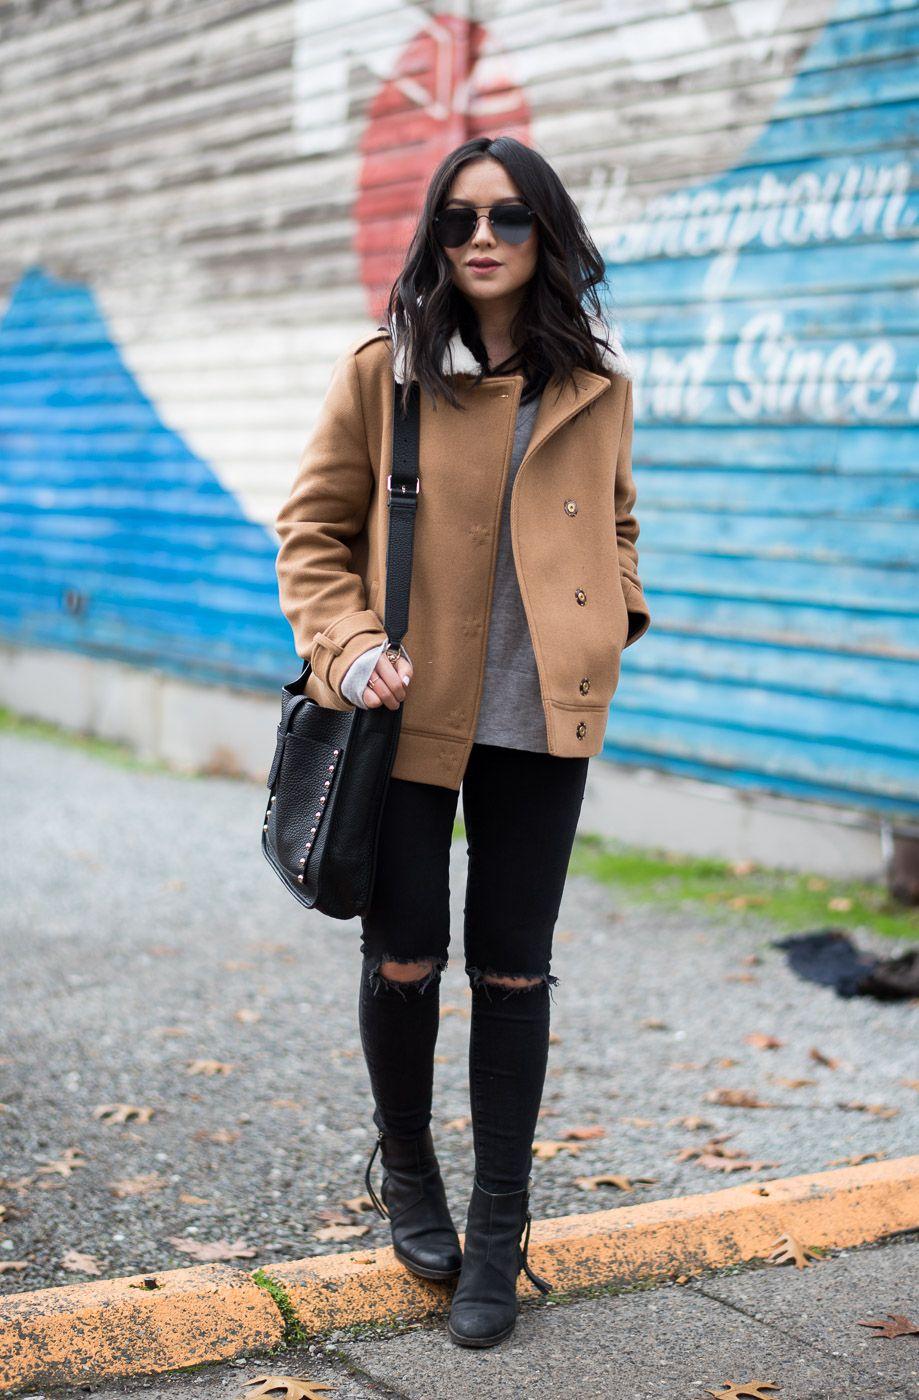 ca1b4496a3c42 sezane-hamptons-jacket-fall-october-2016-what-to-wear-in-seattle-2 ...